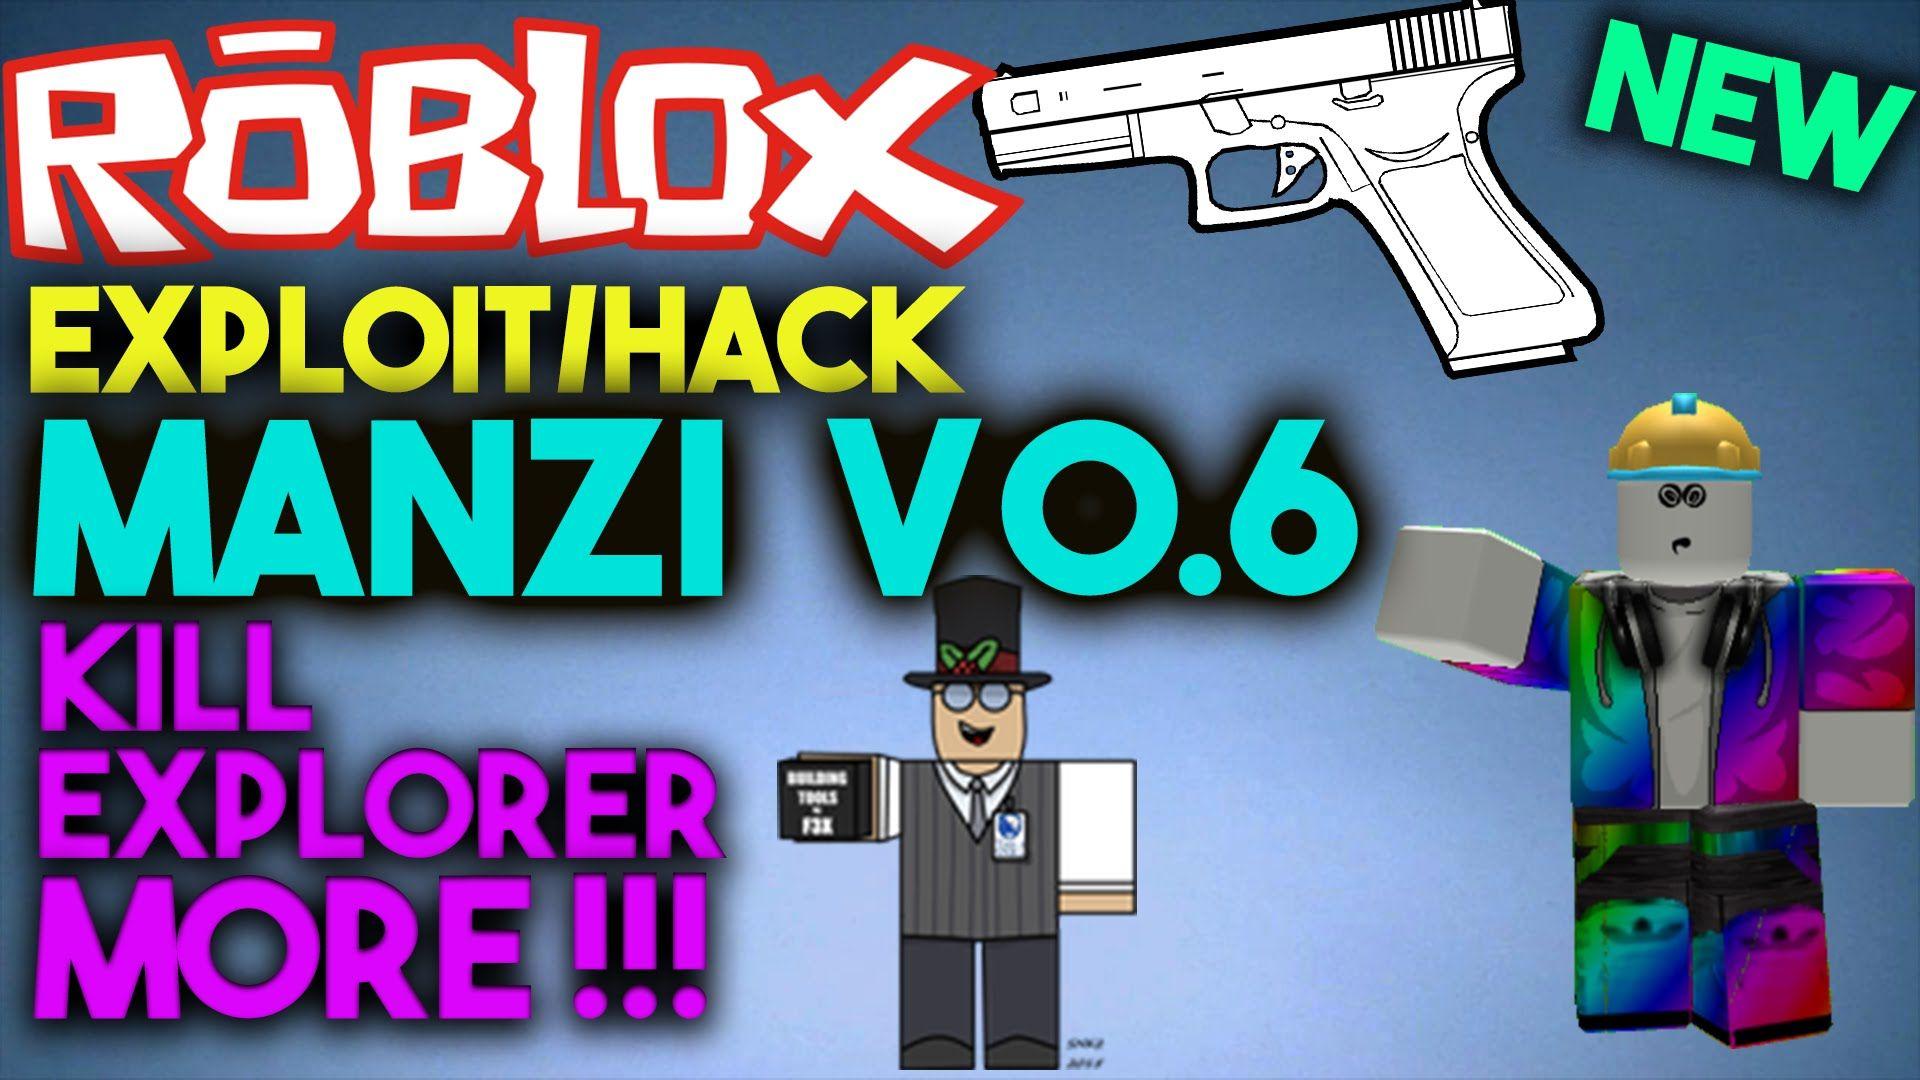 Roblox Exploit Roblox Exploits Nerf, Games, Guns